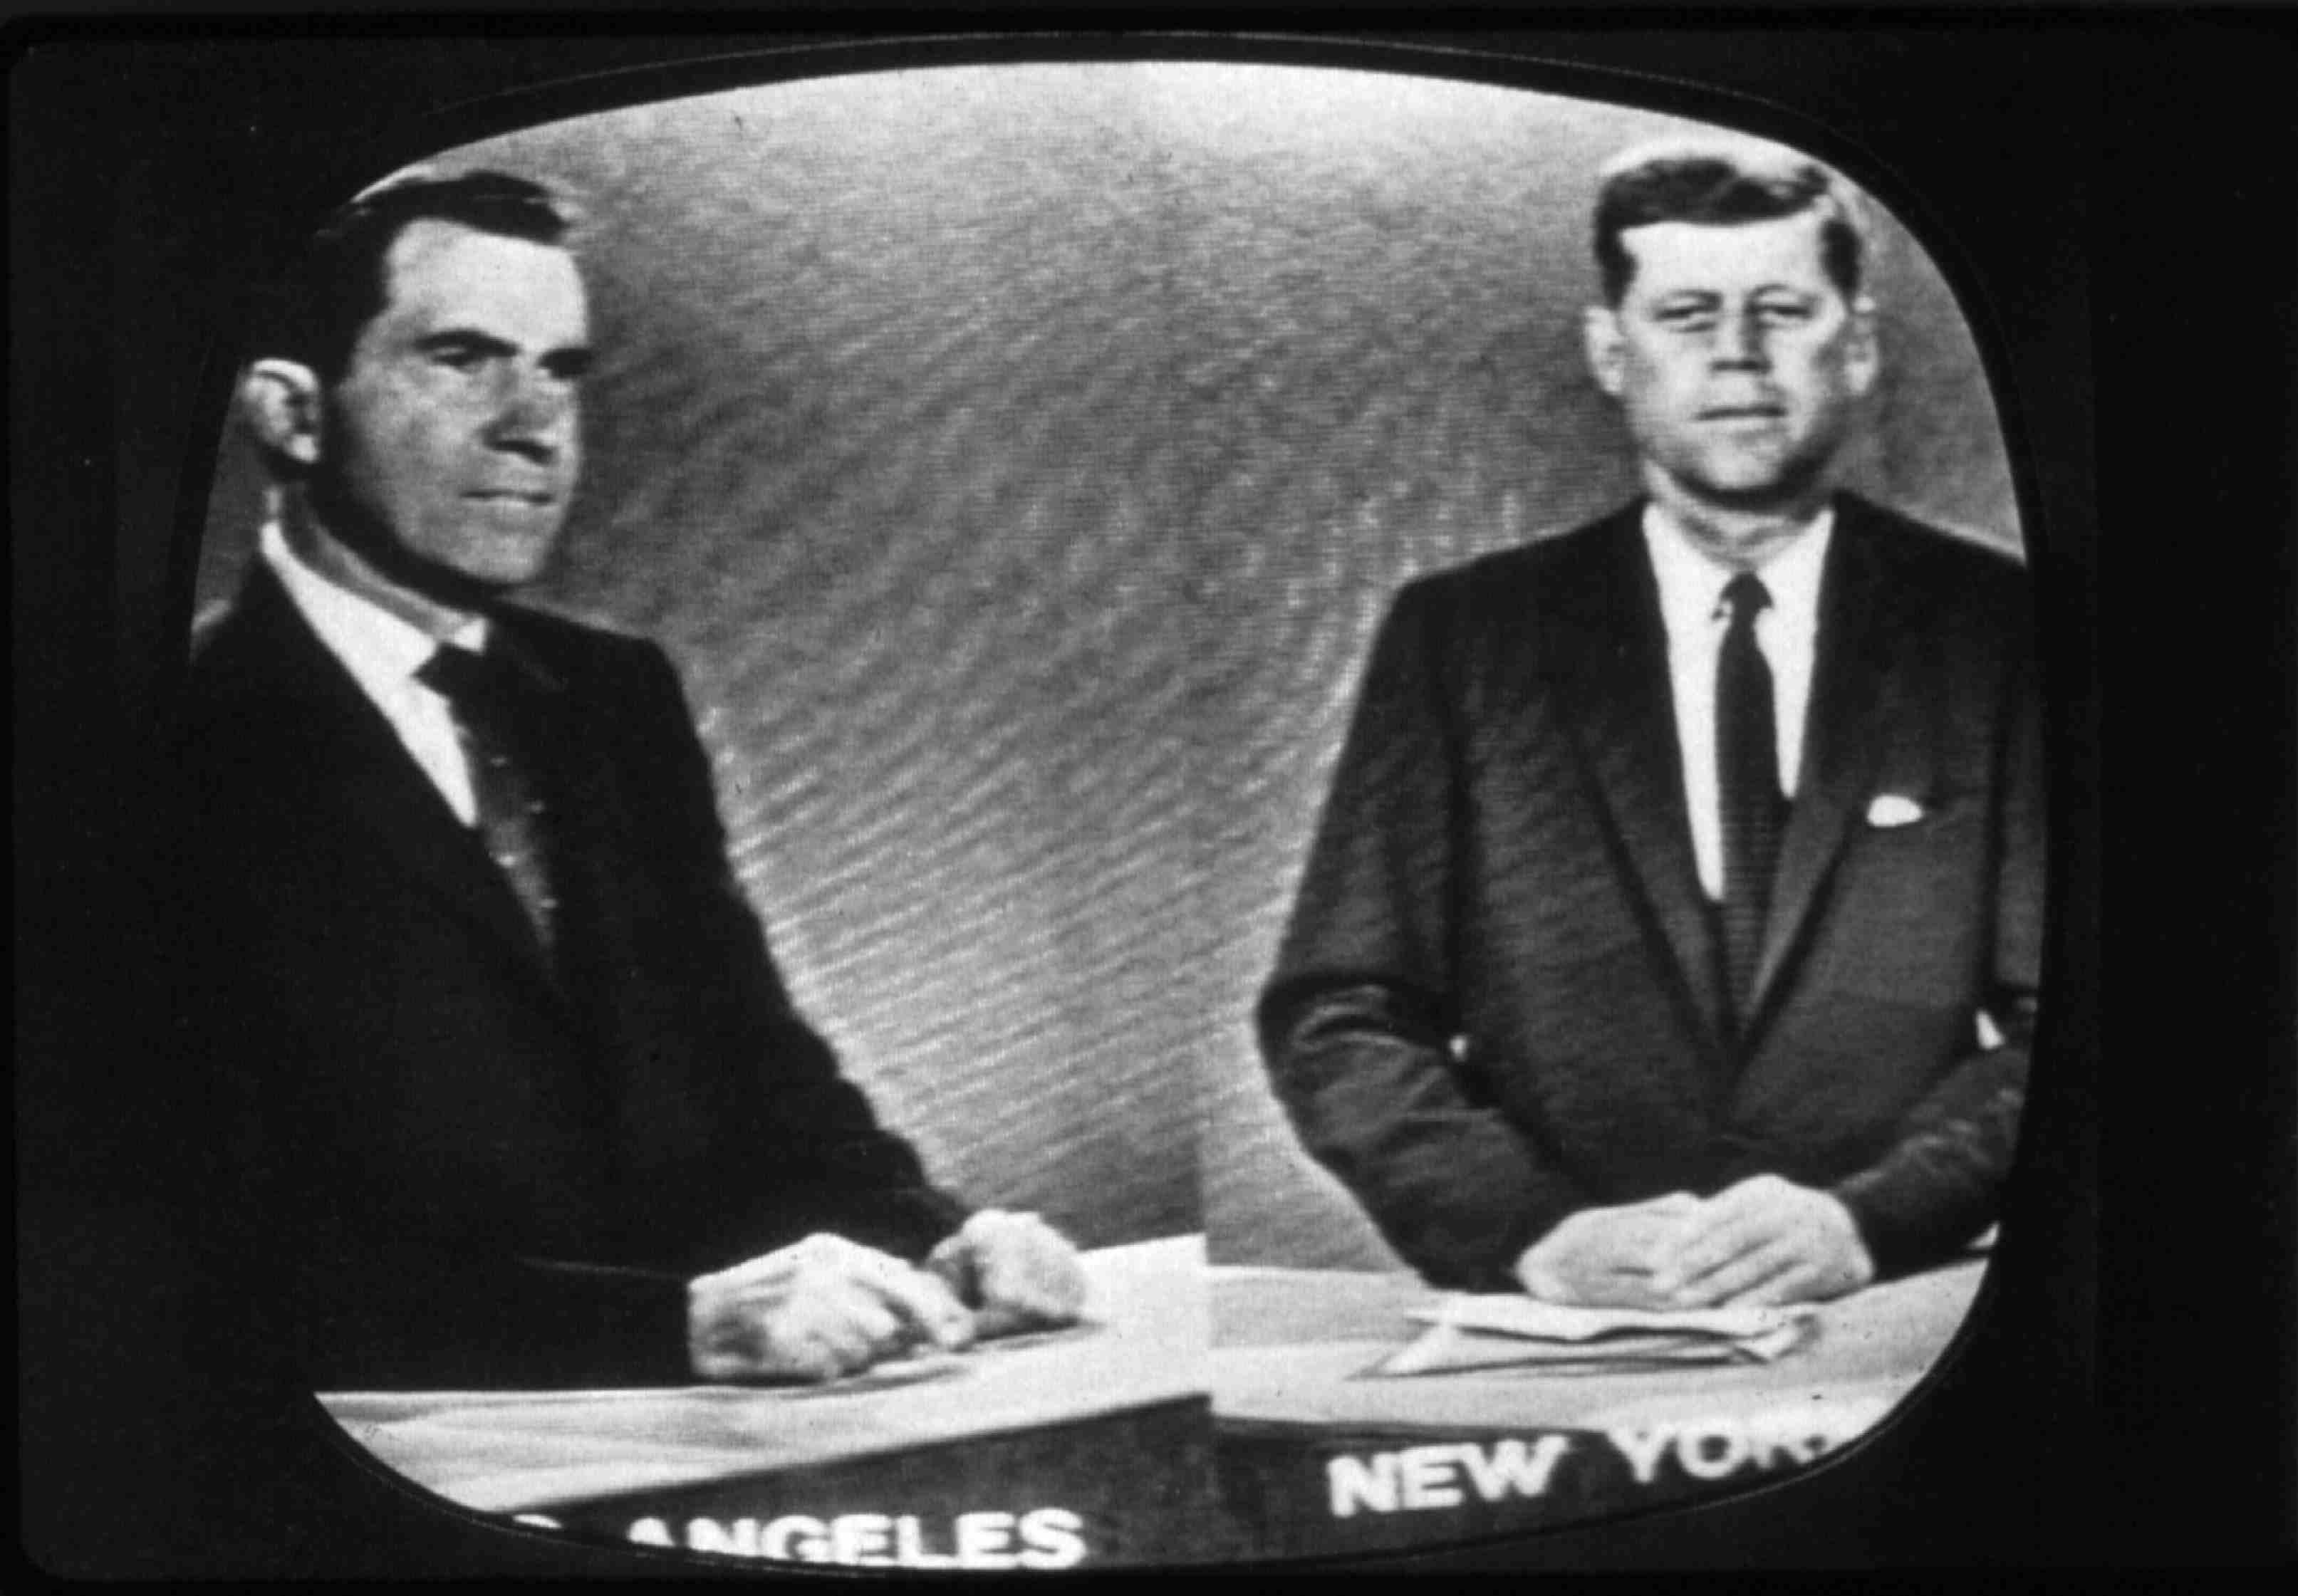 Republican Richard Nixon, left, and Democrat John F. Kennedy